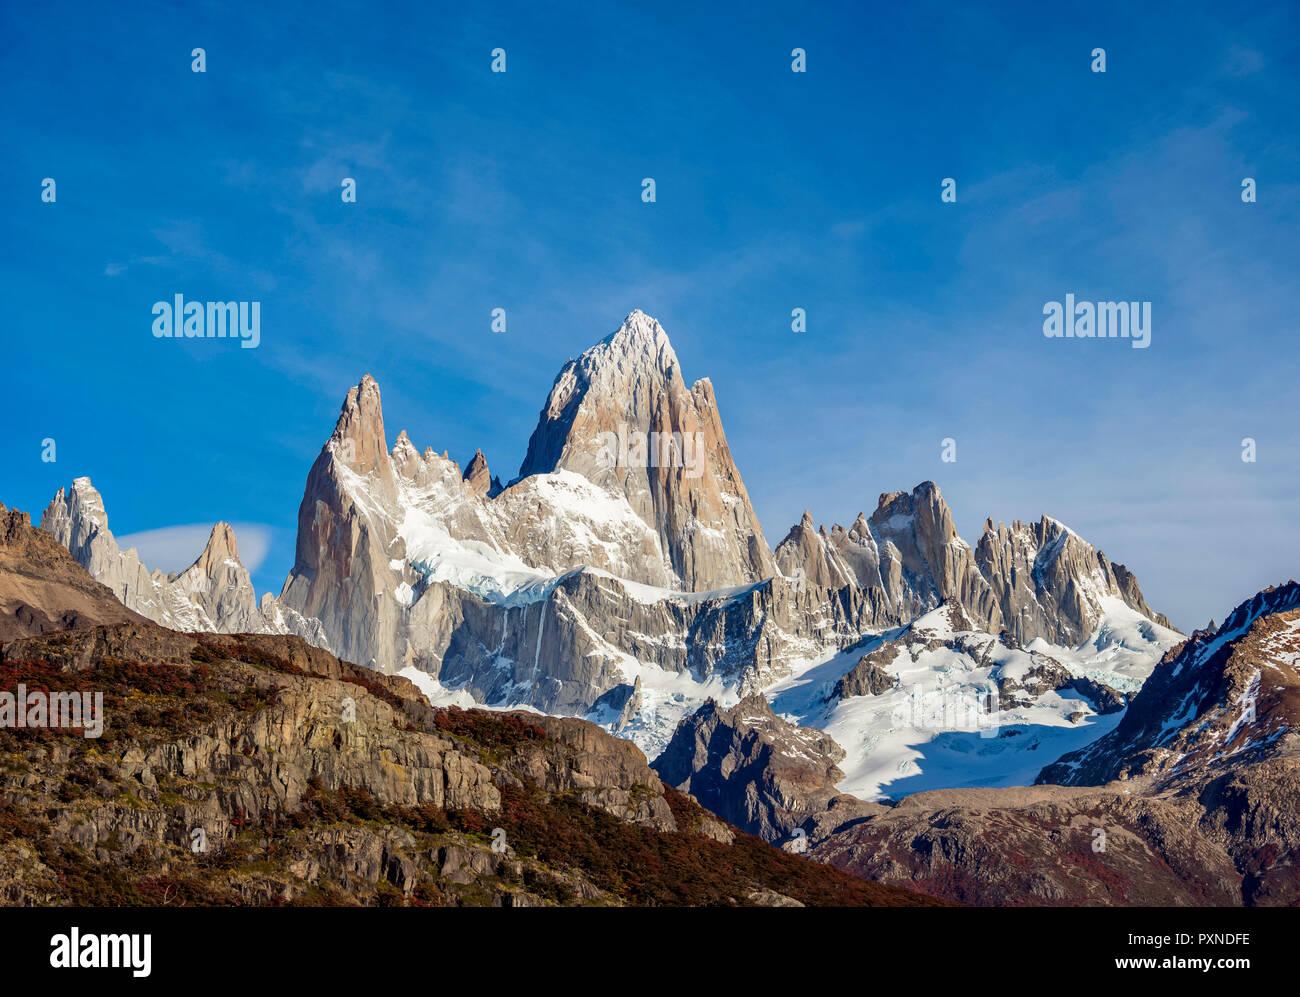 Mount Fitz Roy, Los Glaciares National Park, Santa Cruz Province, Patagonia, Argentina - Stock Image